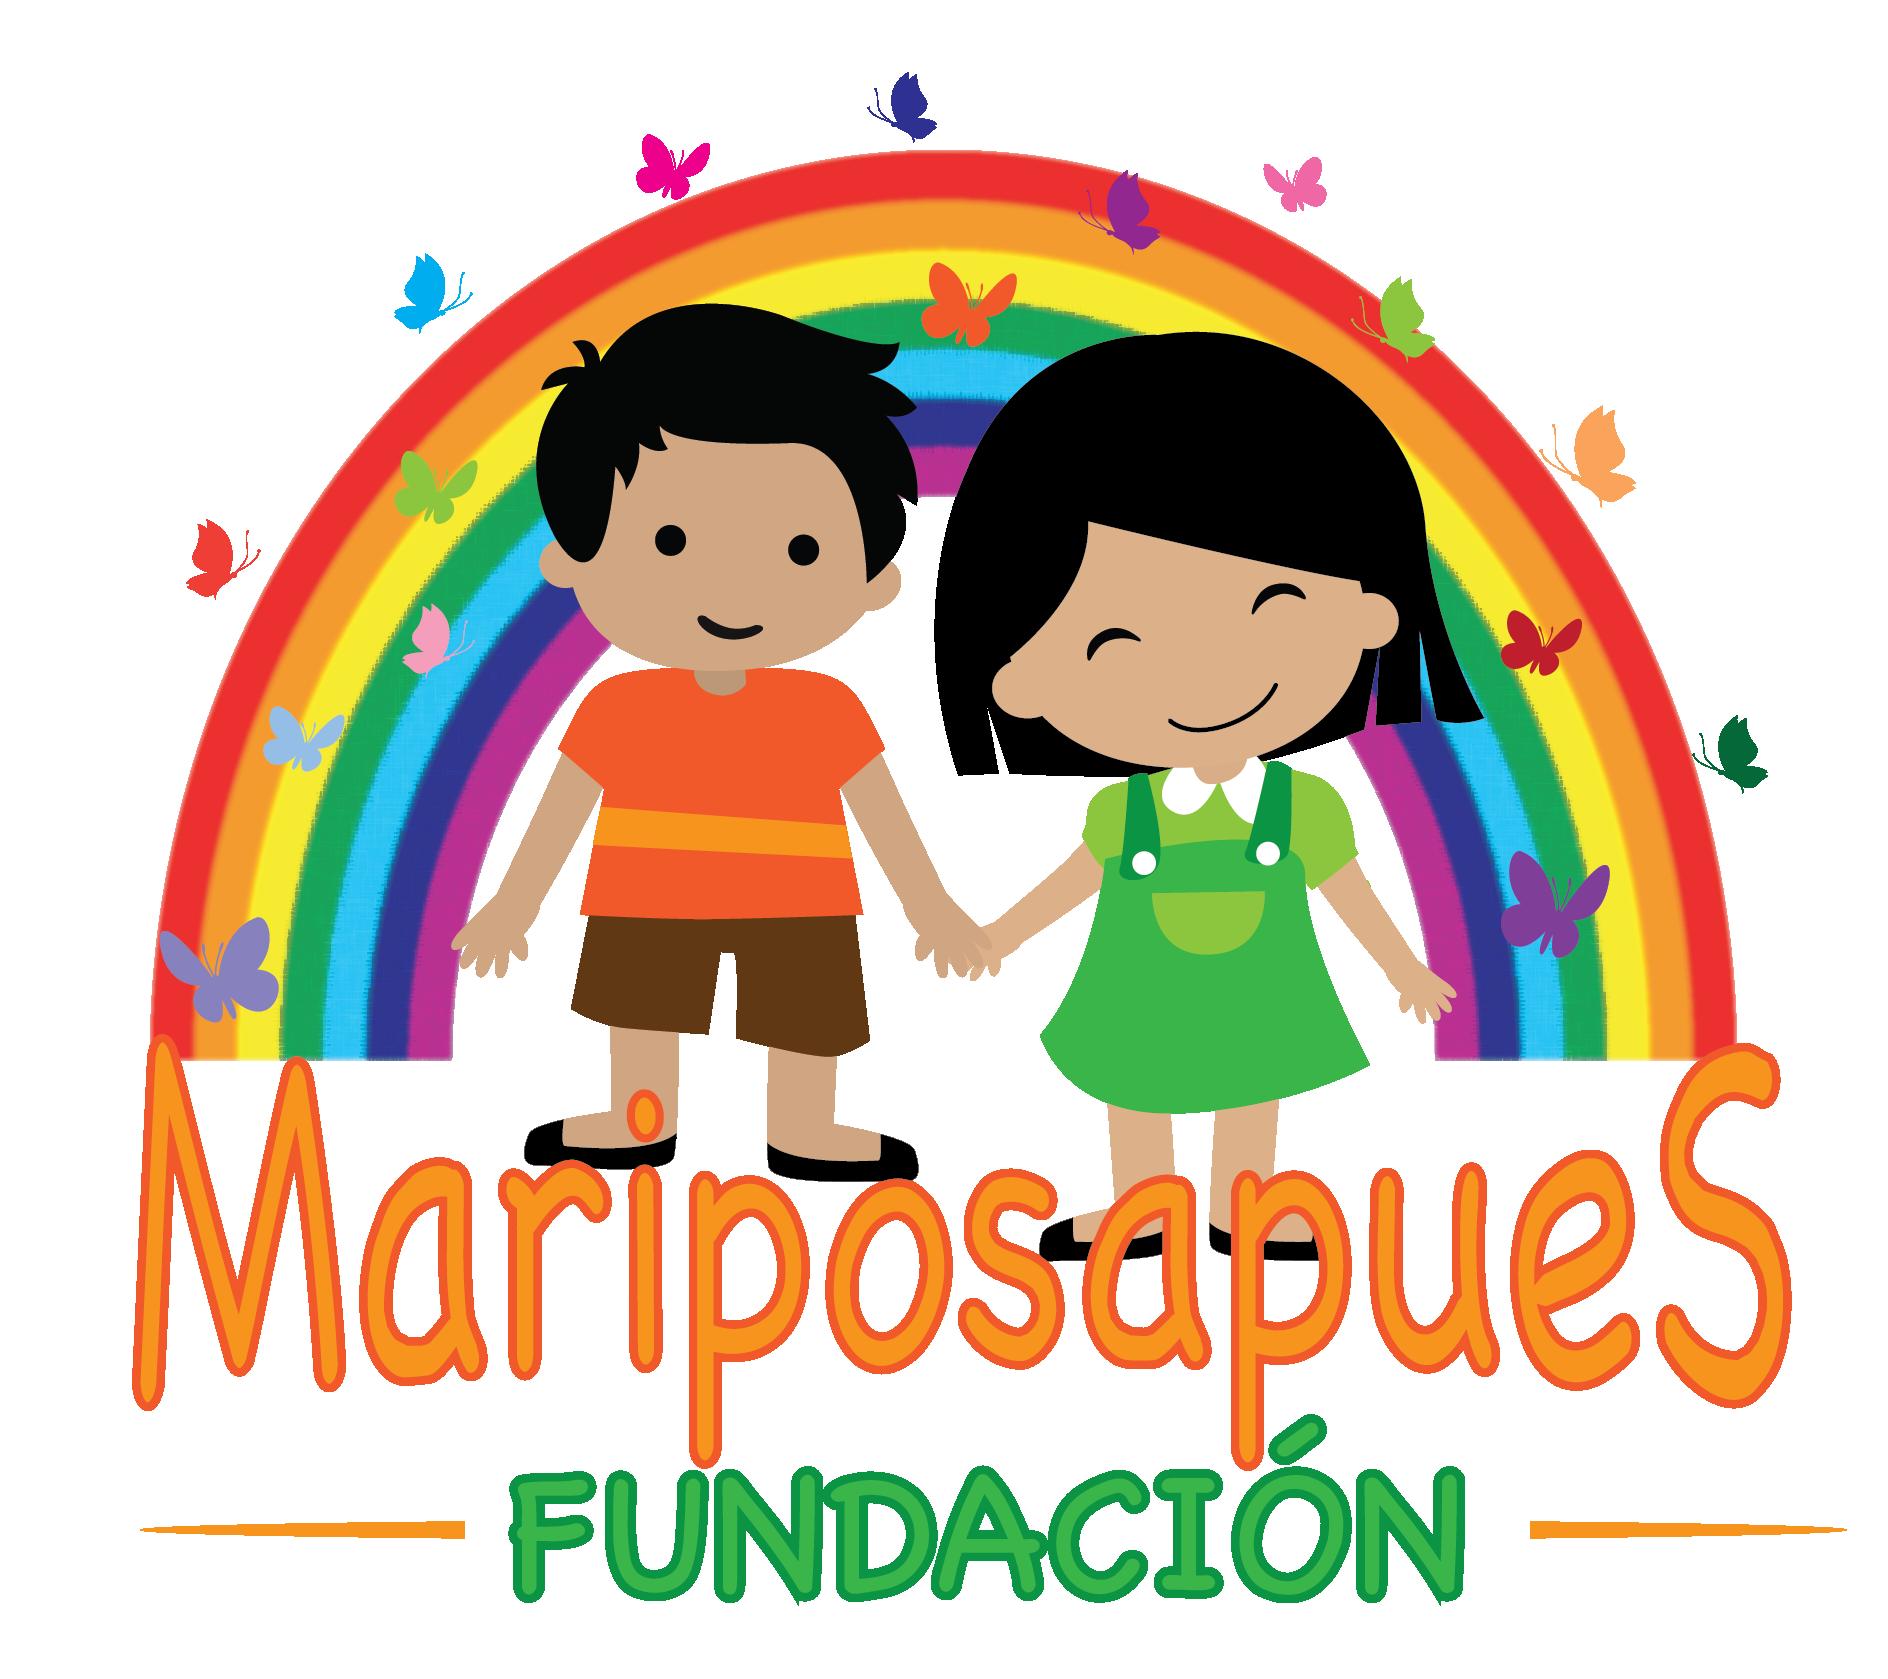 Fundaci n mariposapues ngo. Volunteering clipart non profit